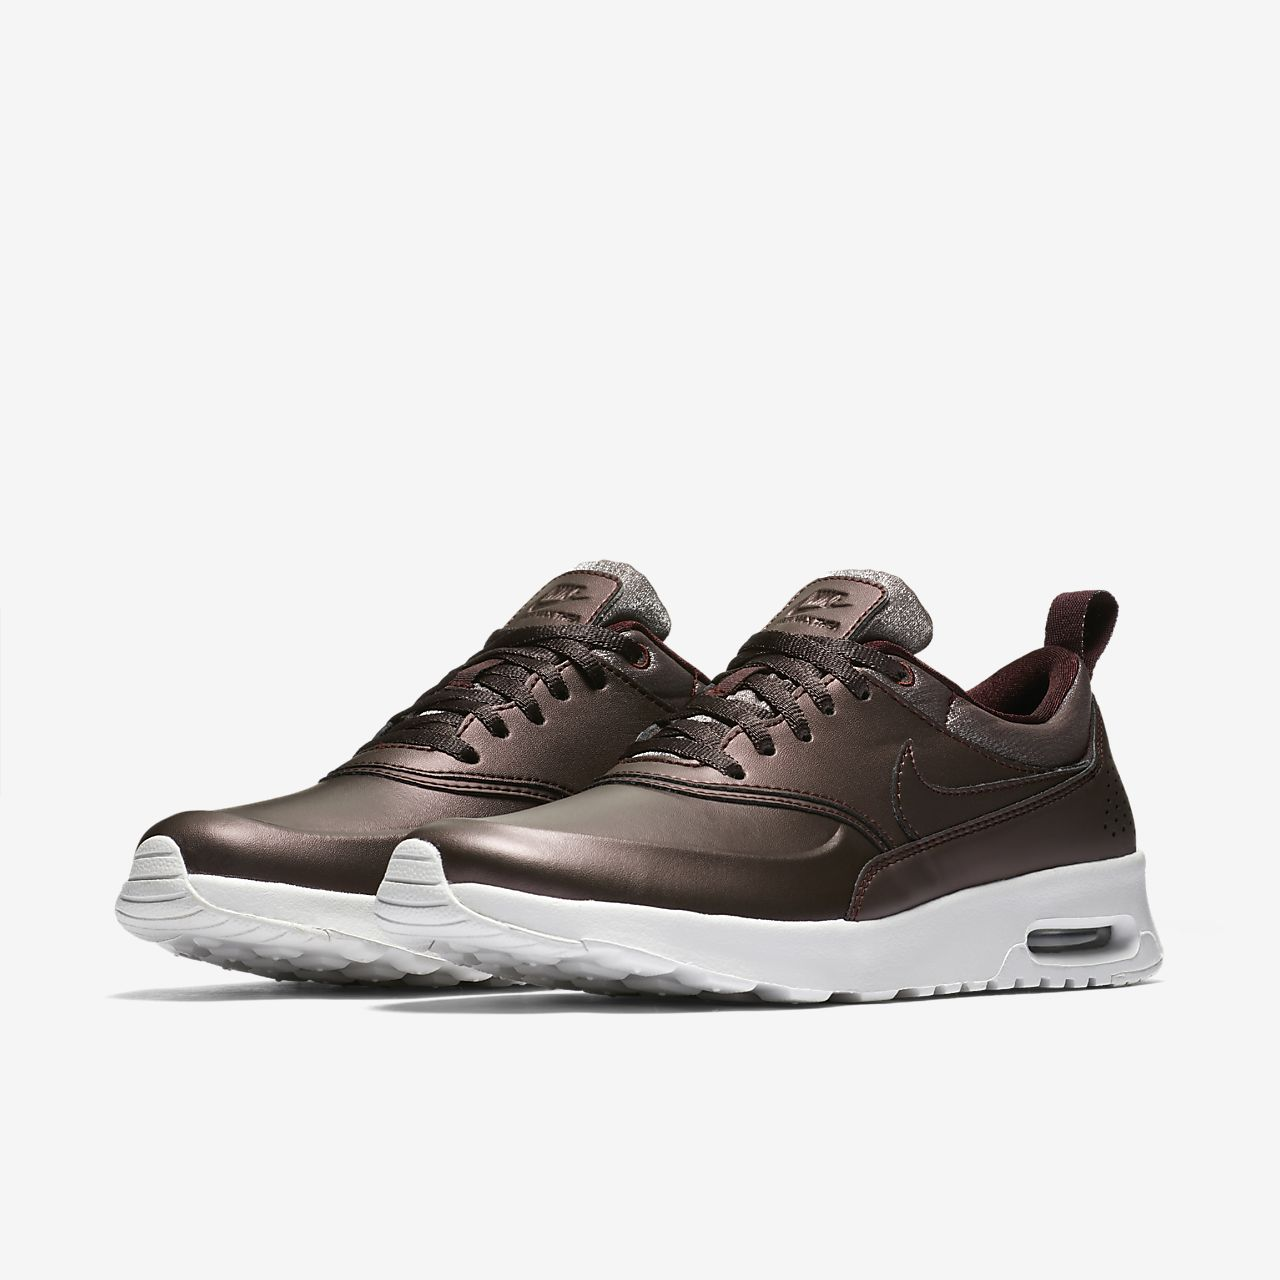 nike air max thea premium leather - dames schoenen